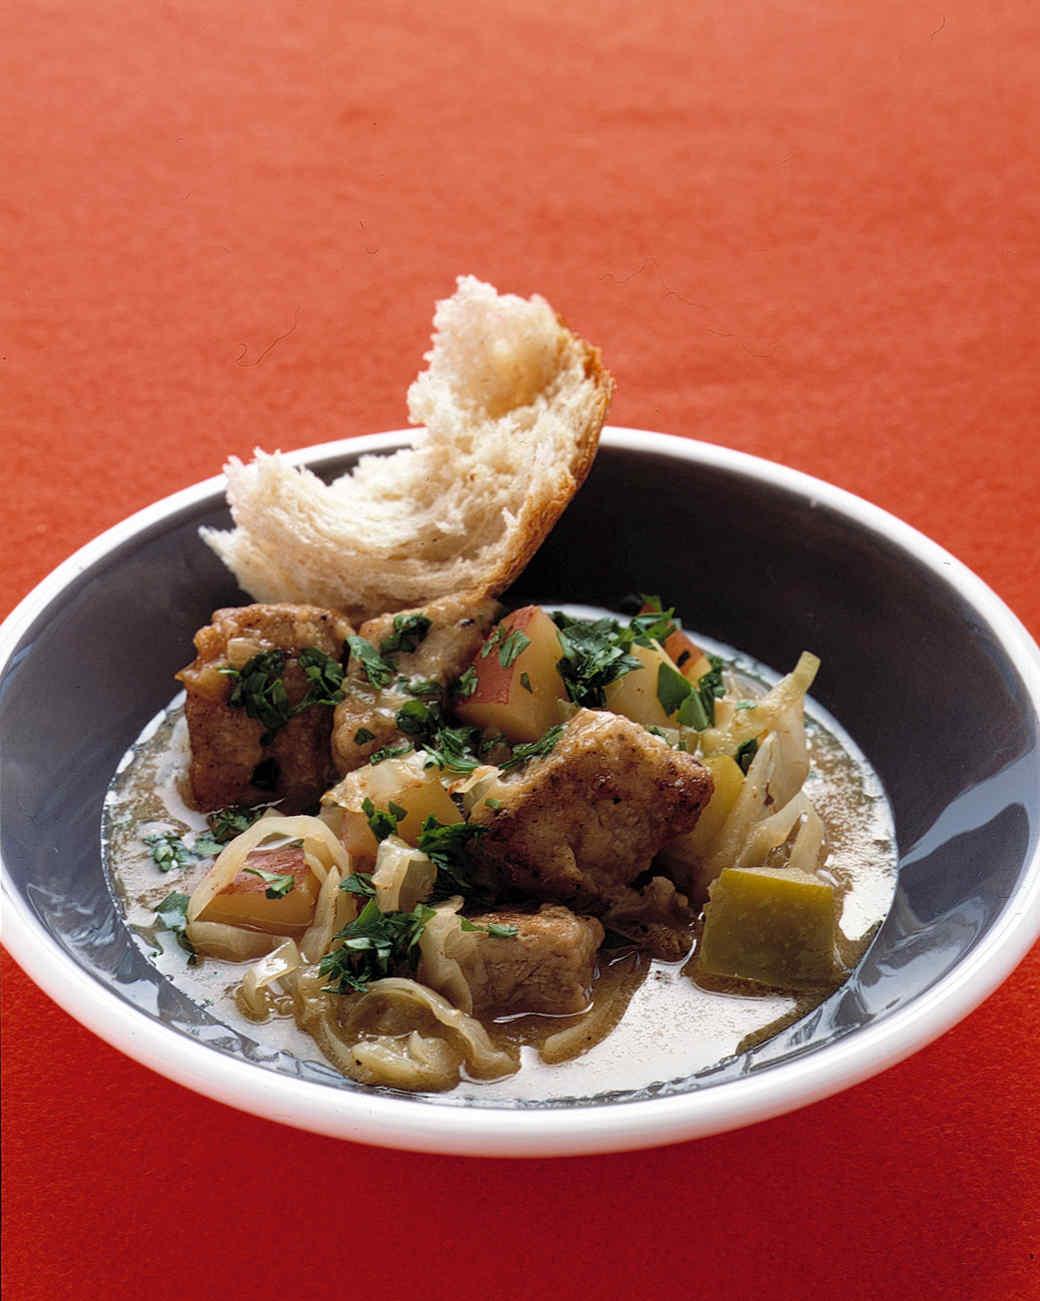 Pork-and-Apple Stew